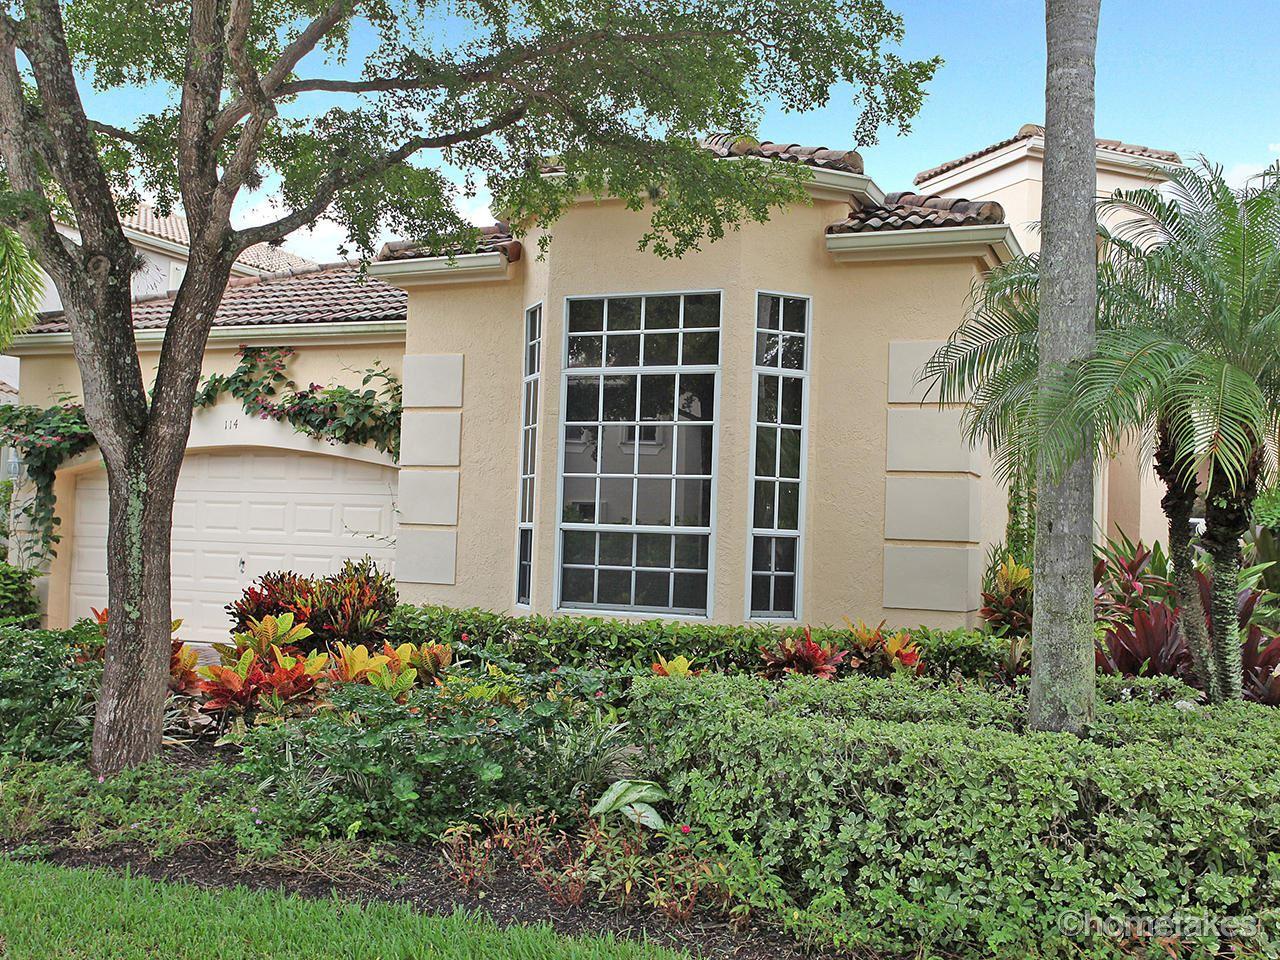 Photo of 114 Sunset Cove Lane, Palm Beach Gardens, FL 33418 (MLS # RX-10716350)